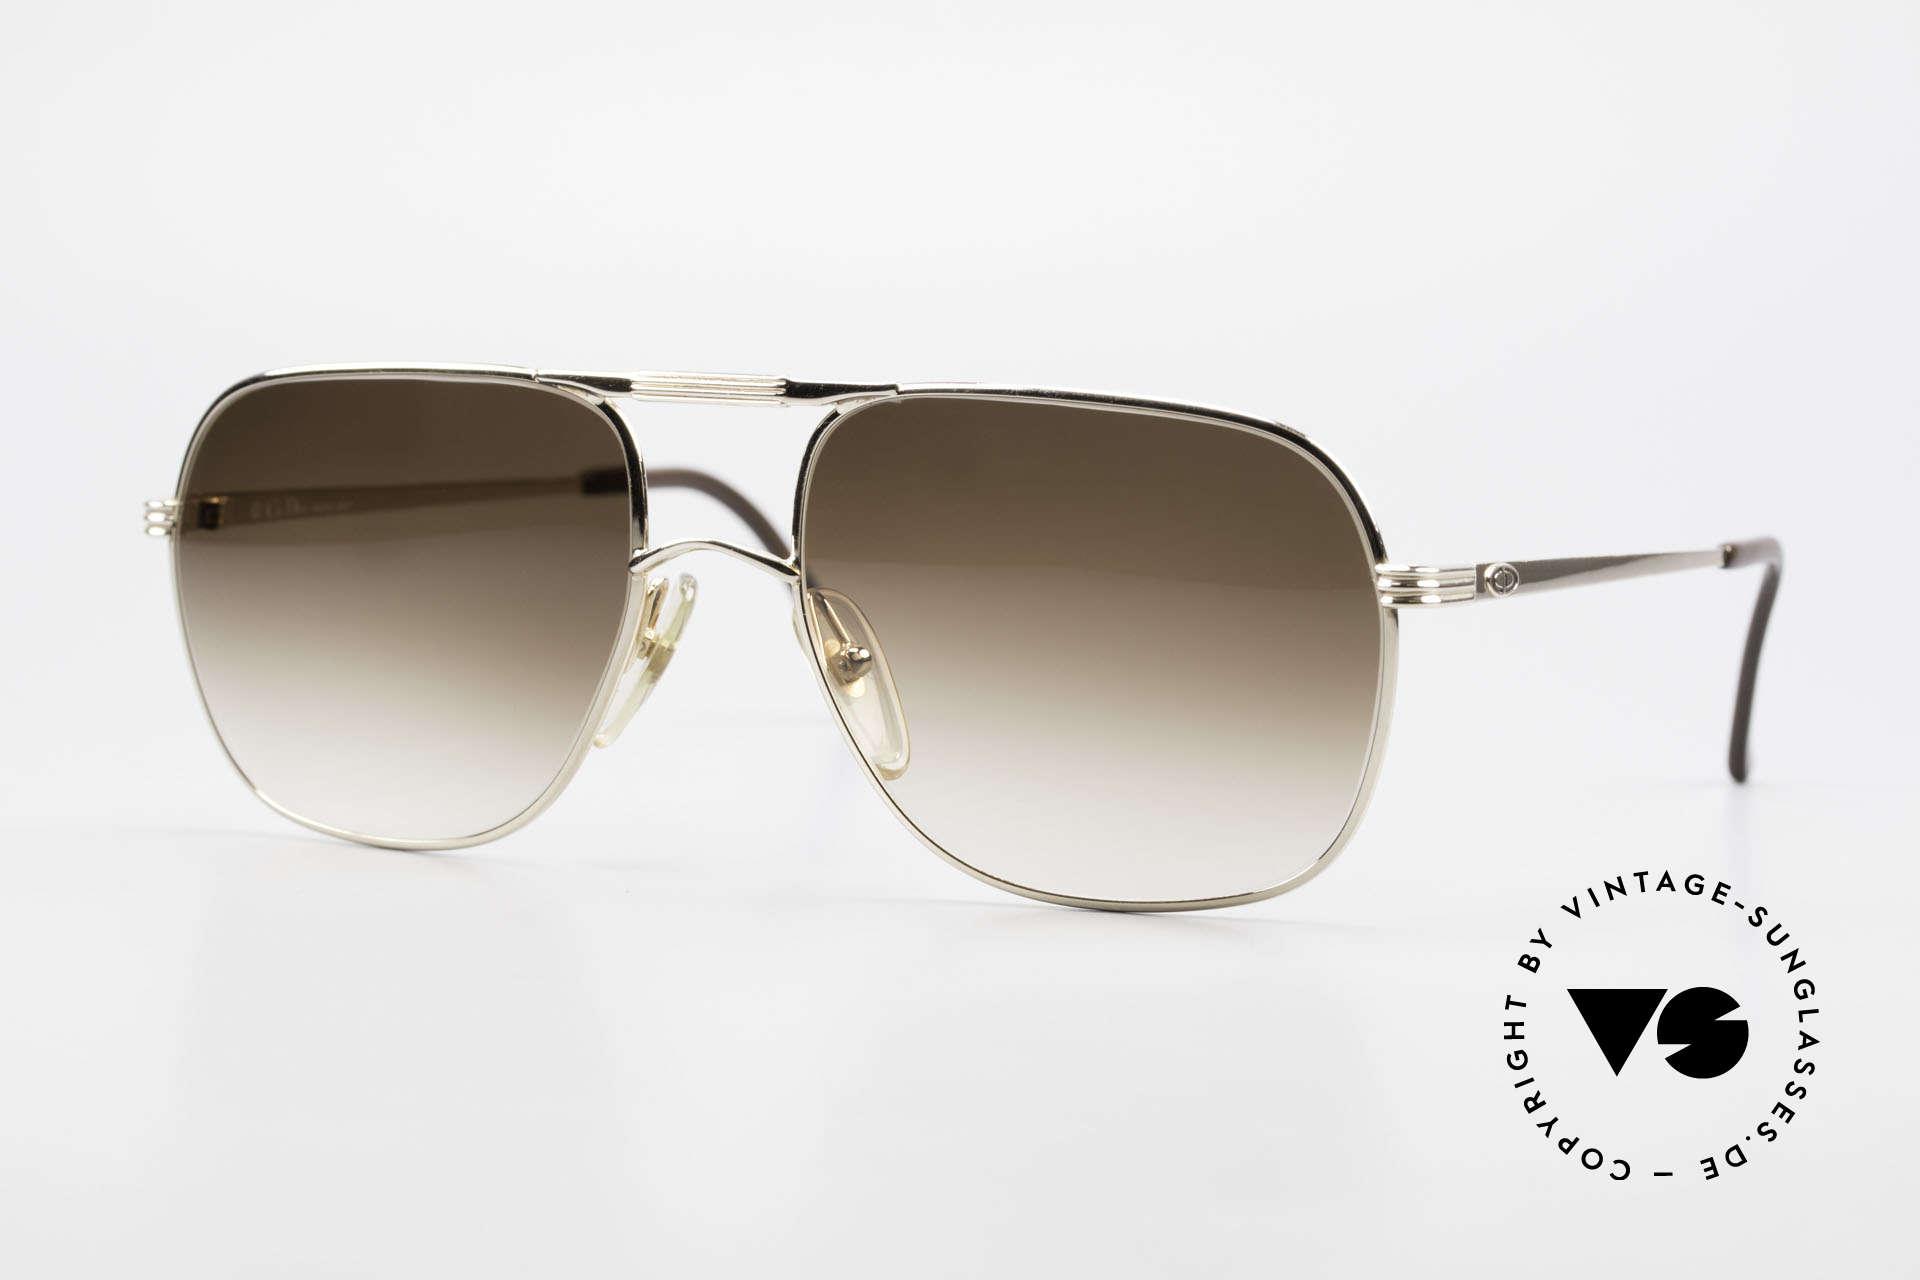 Christian Dior 2443 80's Dior Monsieur Sunglasses, exquisite gents model by Christian Dior 'MONSIEUR', Made for Men